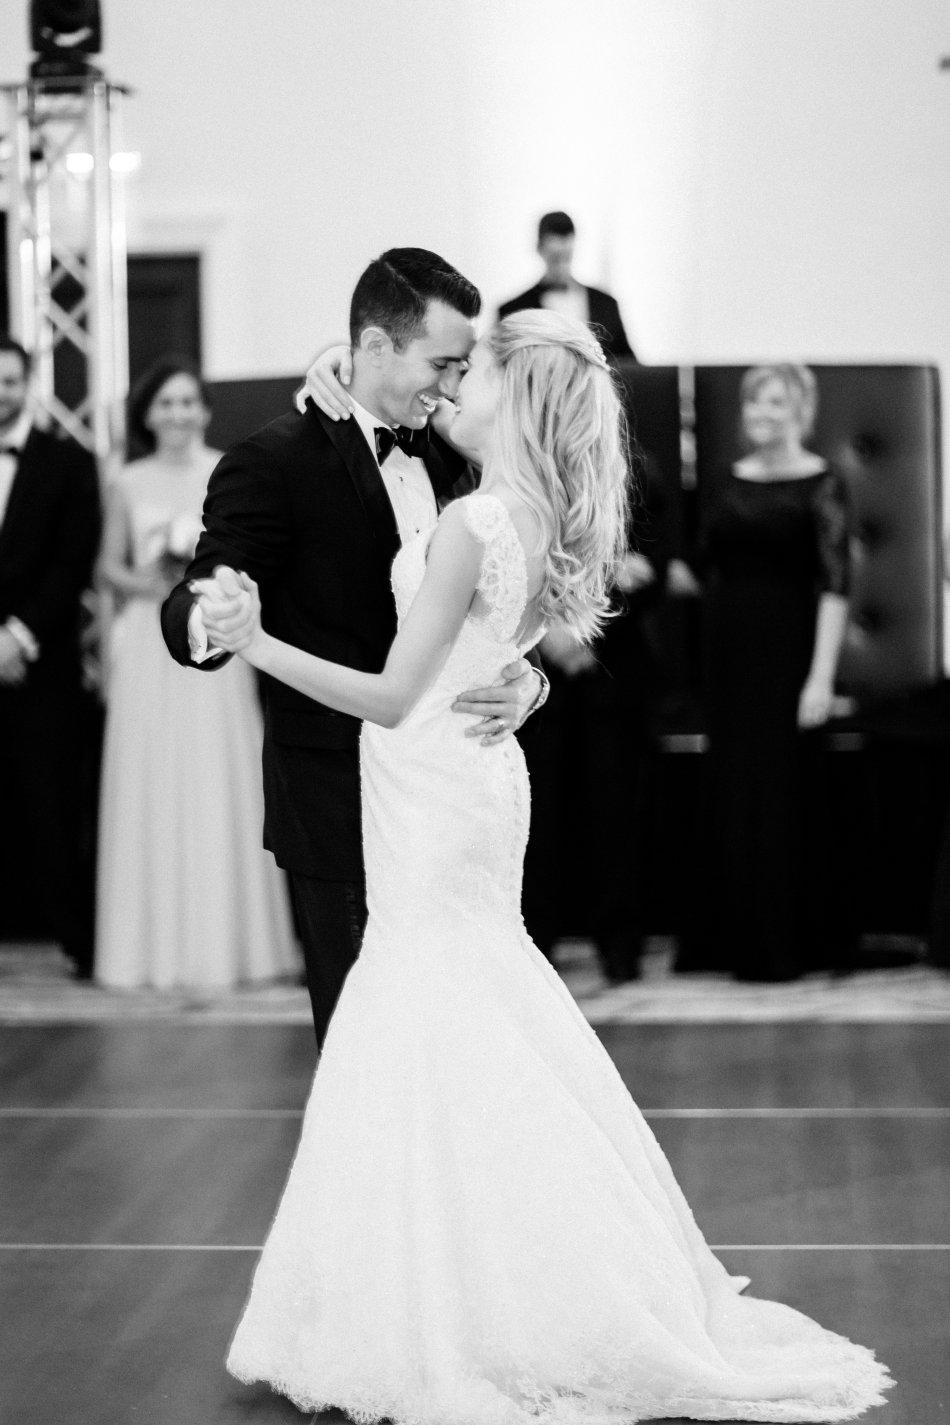 coconut-point-hyatt-wedding-naples-wedding-photography_0572.jpg